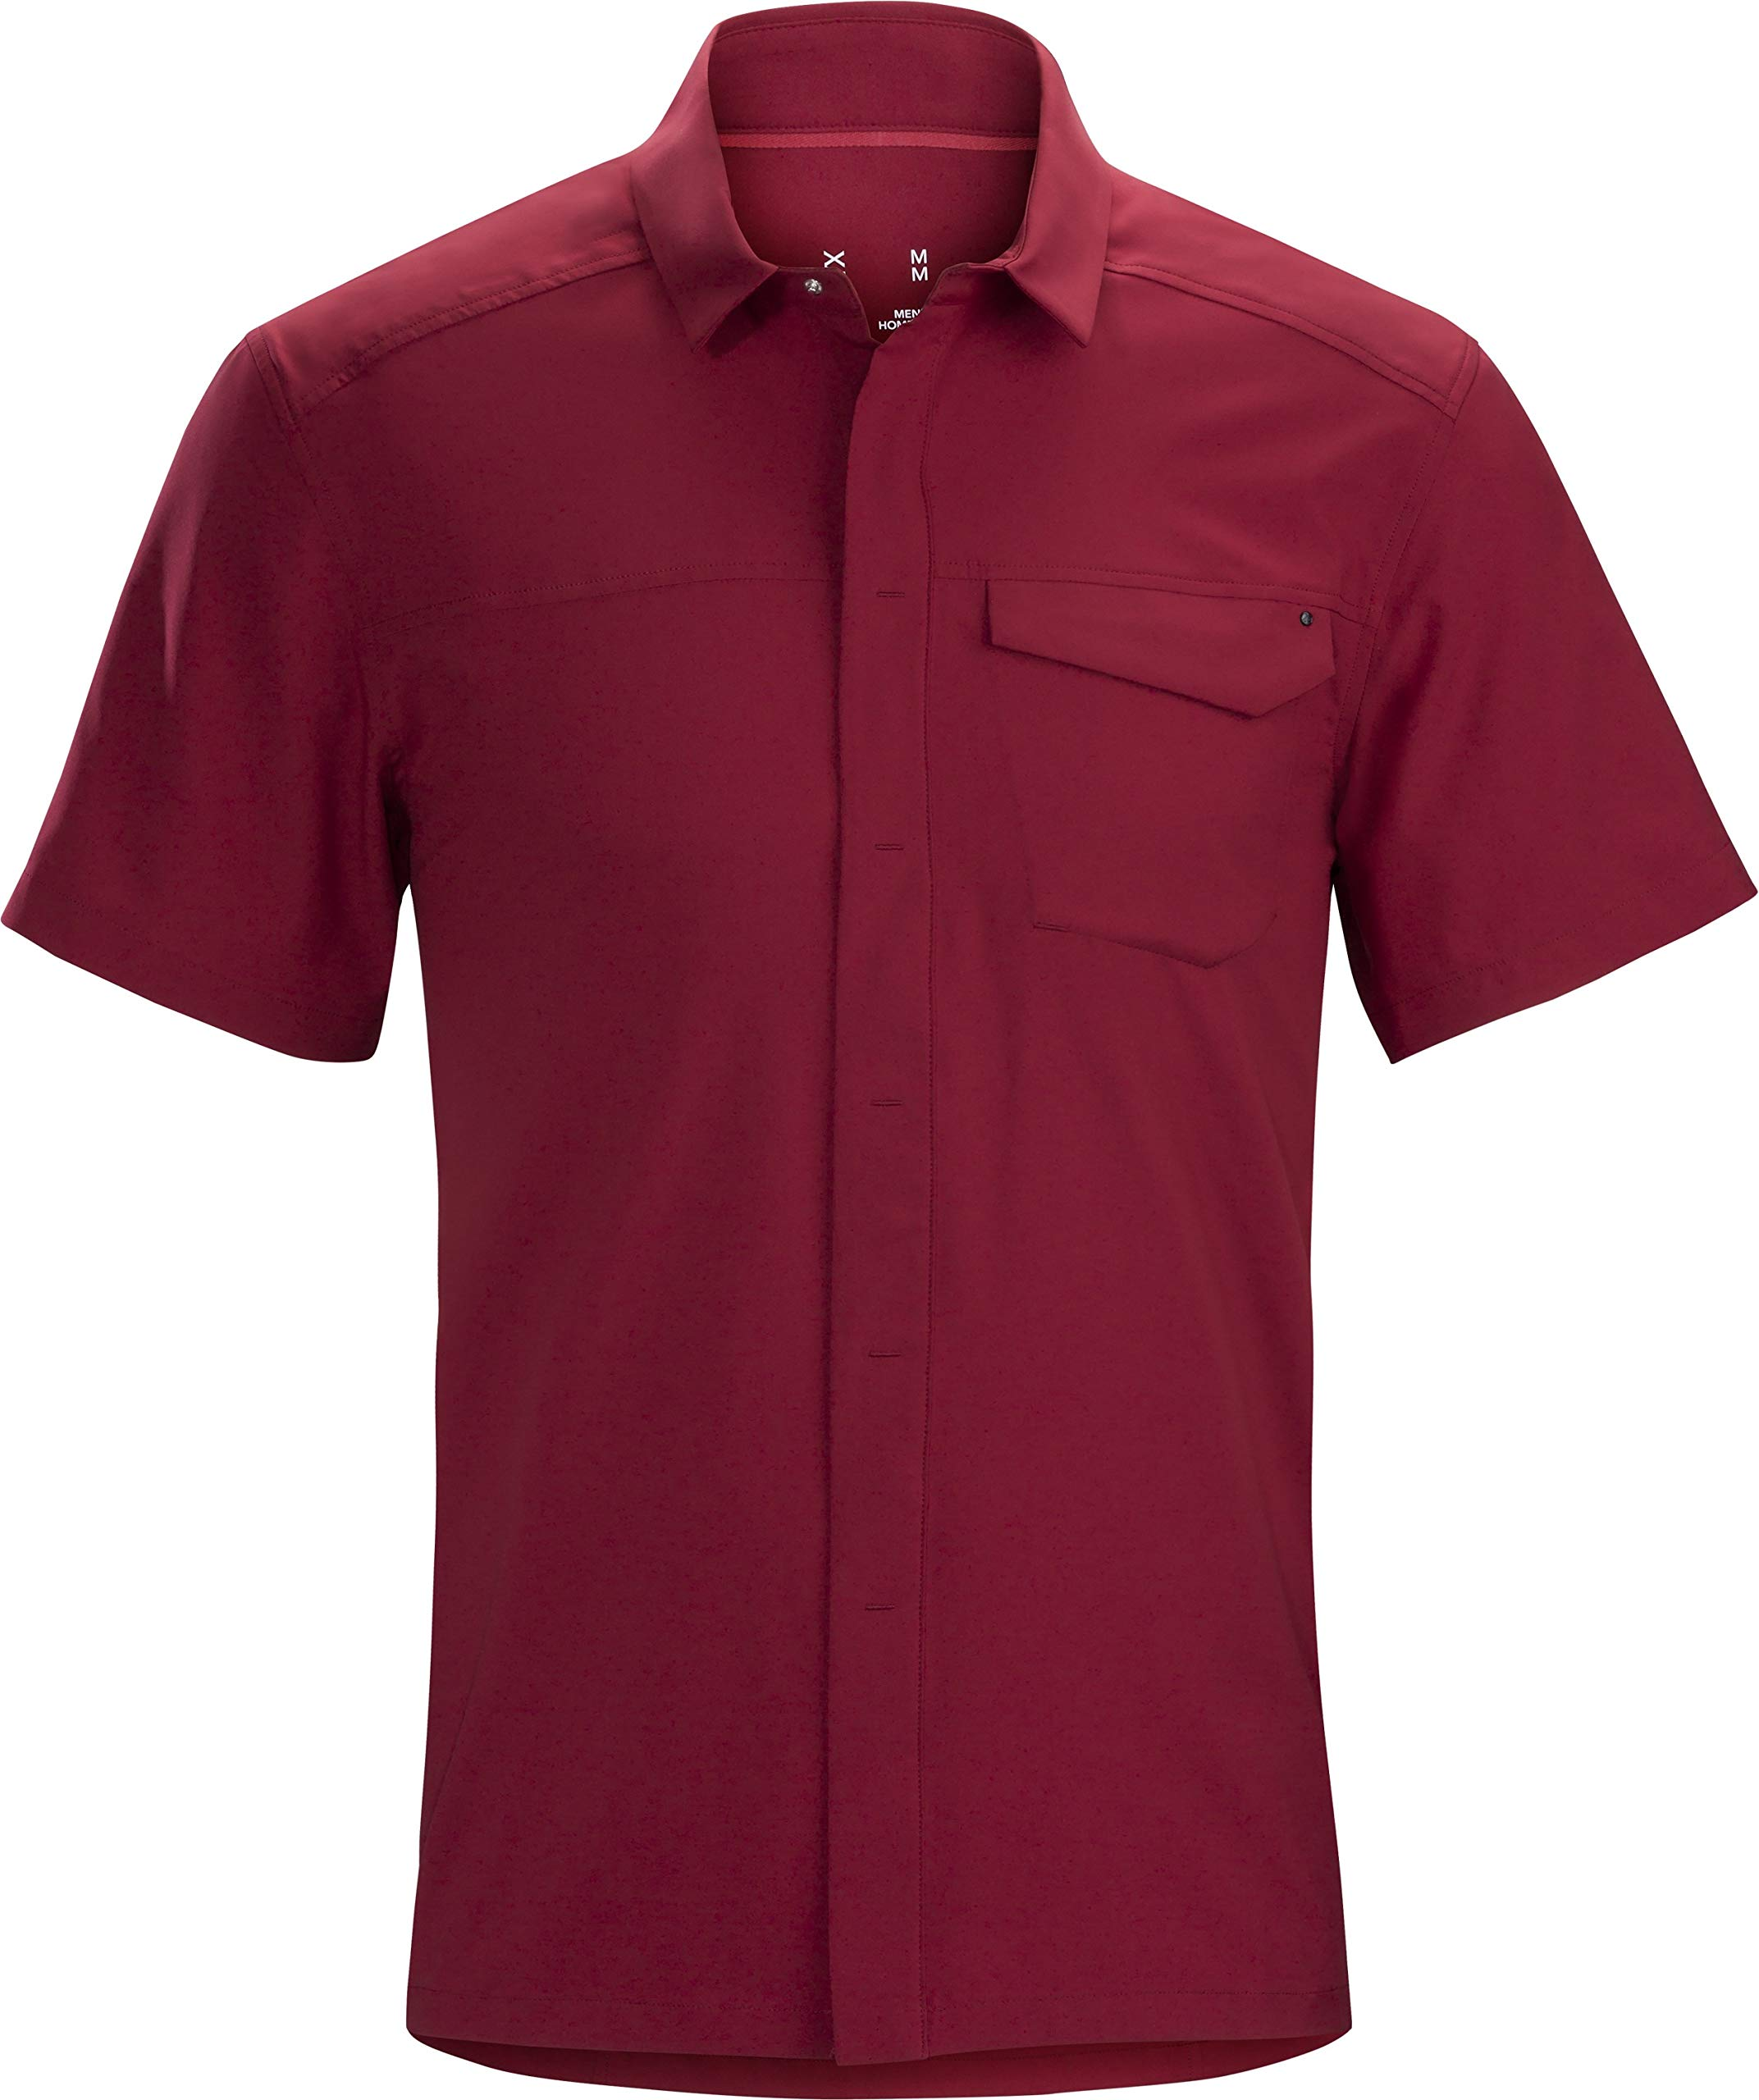 Arc'teryx Skyline SS Shirt Men's (Rohan, Small)